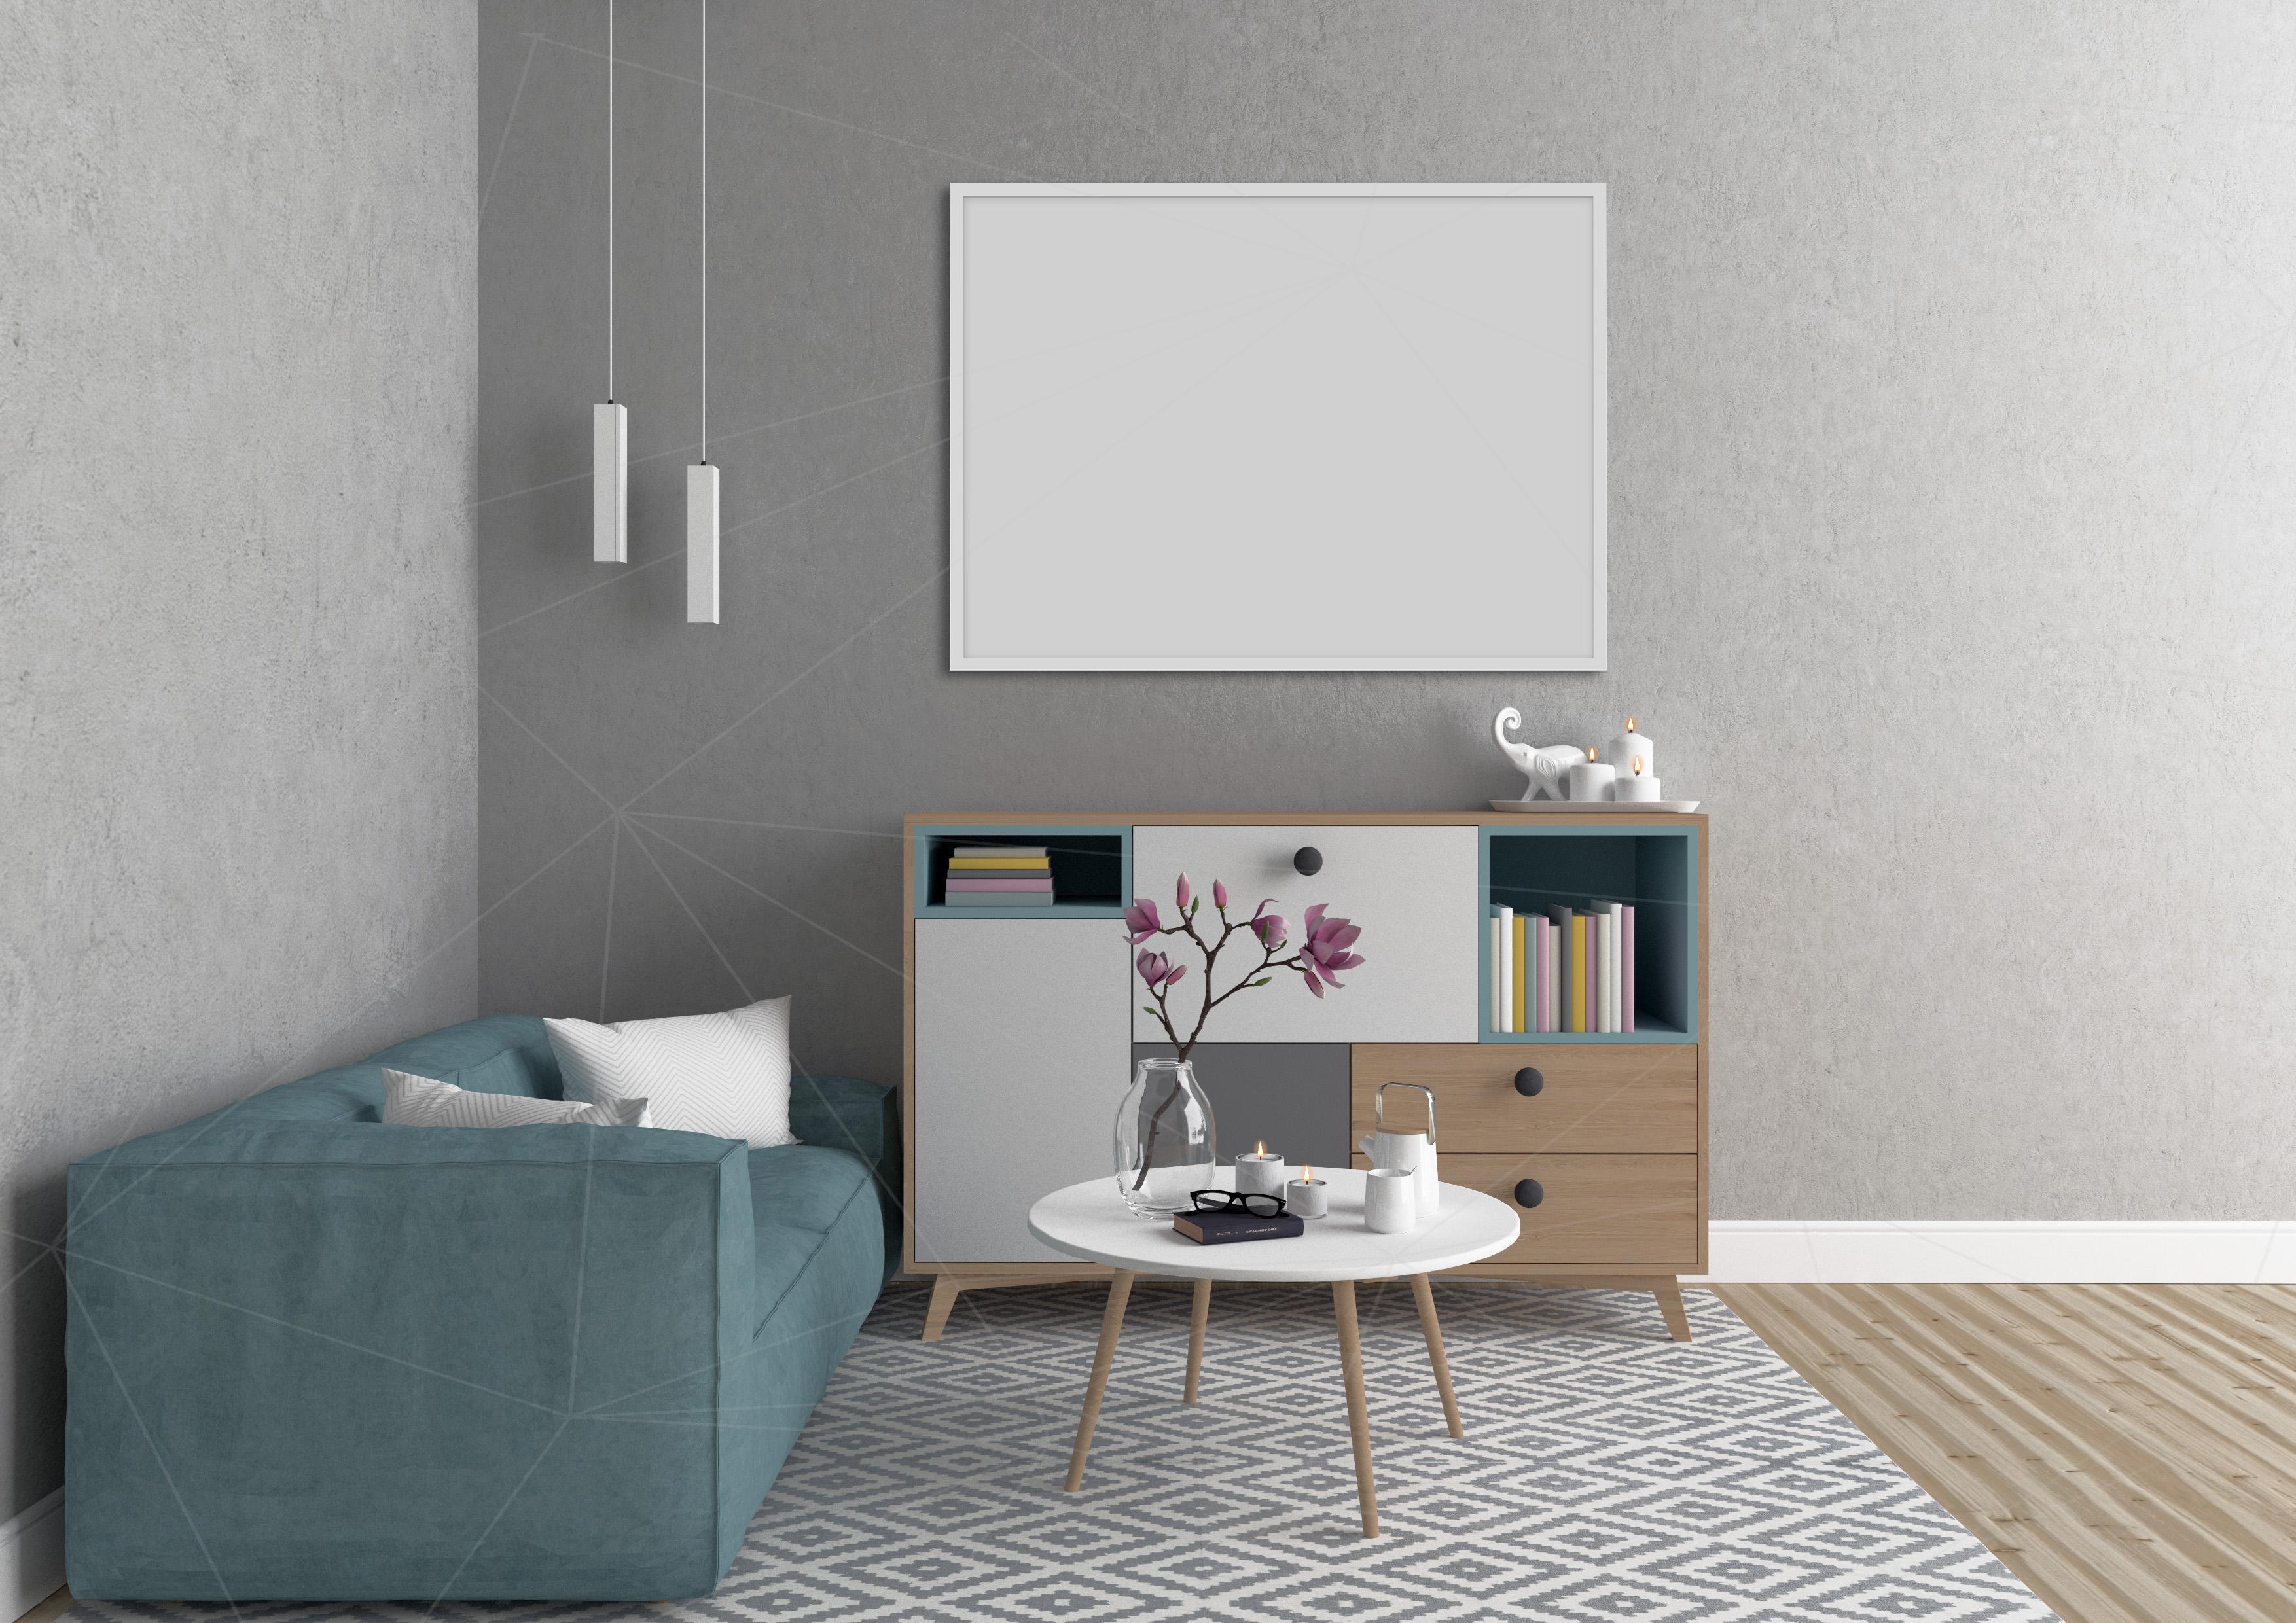 Interior mockup bundle - blank wall mock up example image 3